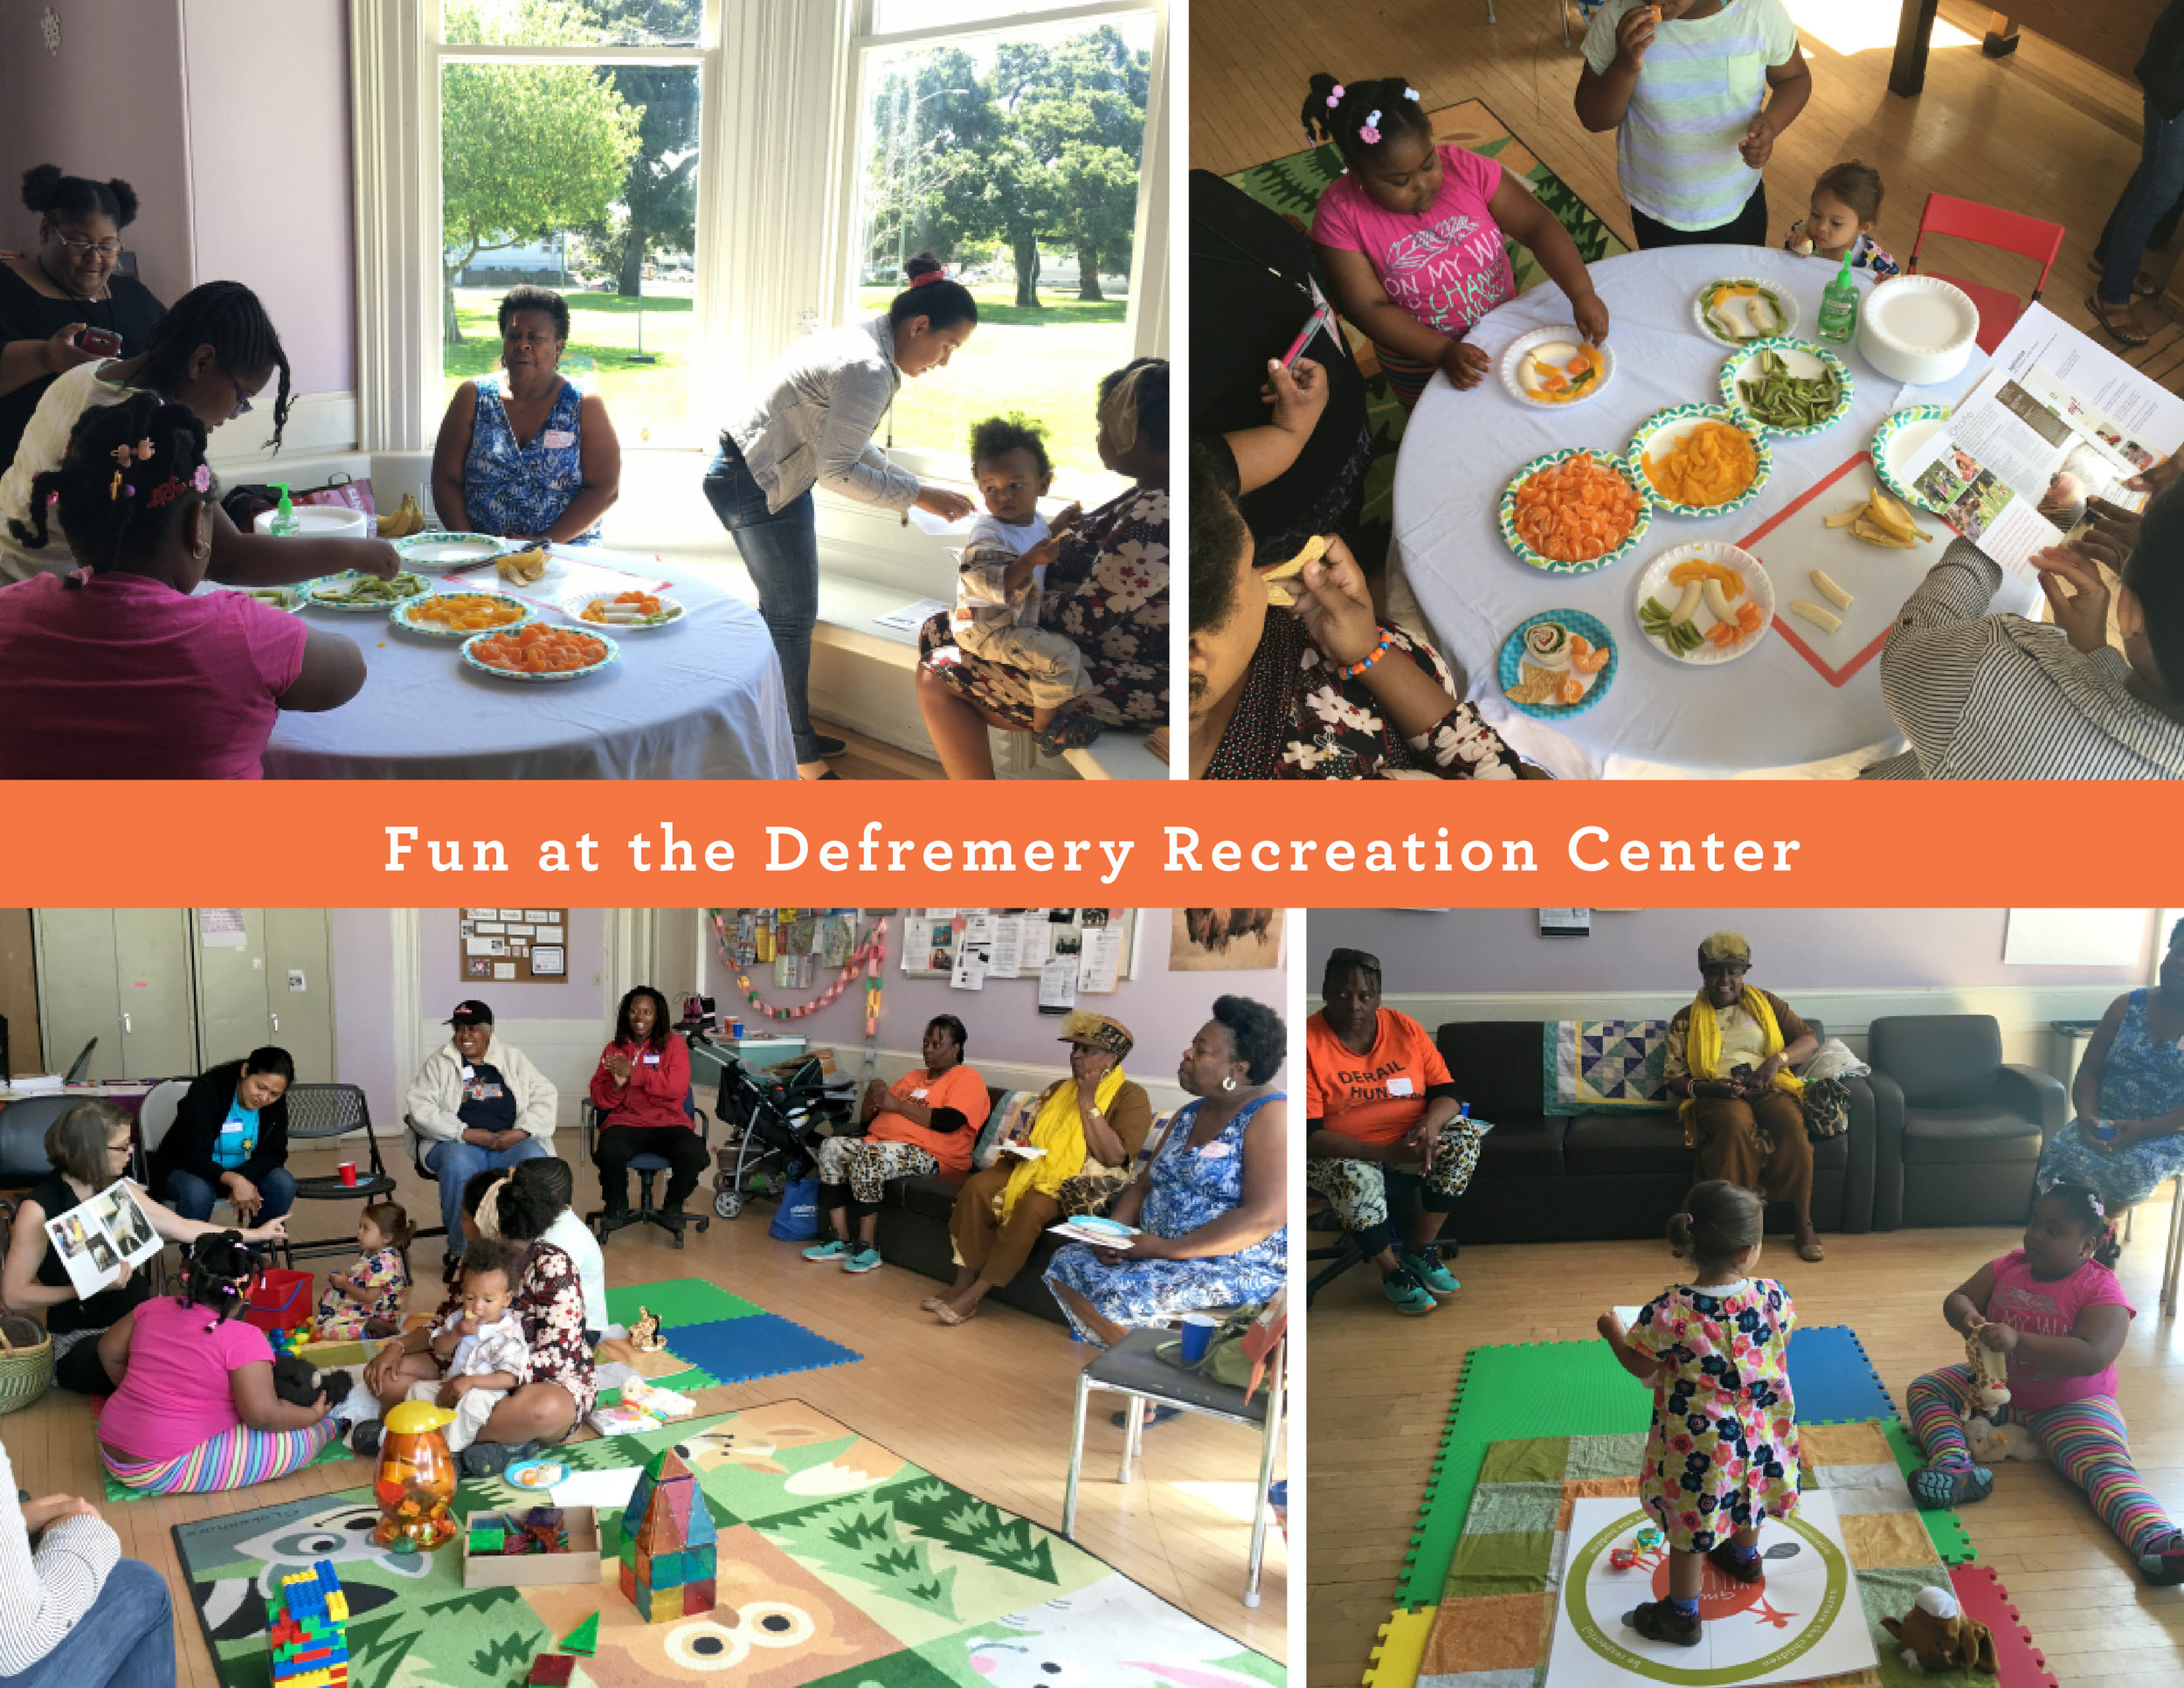 defremery recreation center.jpg